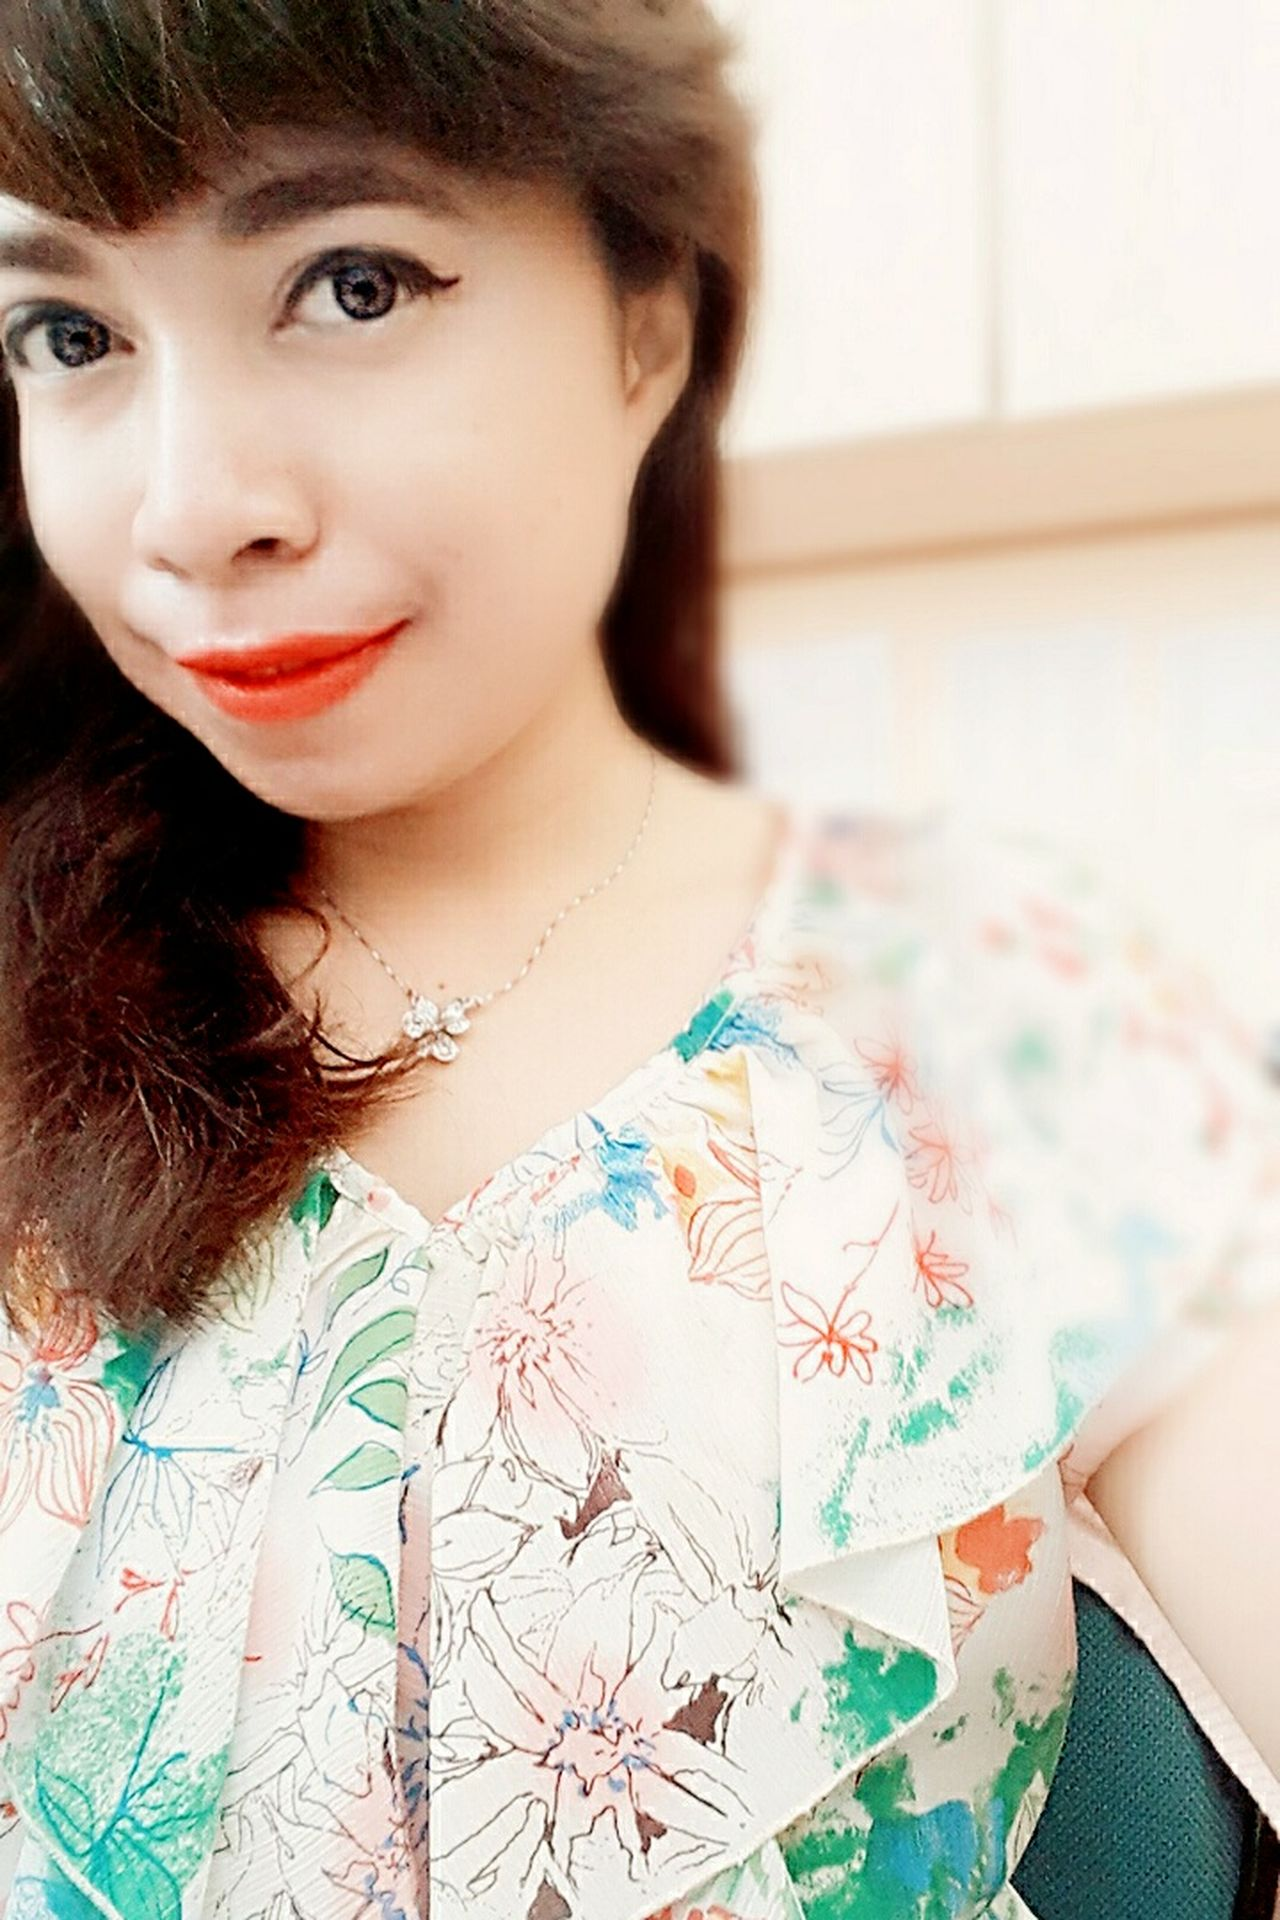 My eyes and ur heart 😍 Hello World That's Me INDONESIA EyeEm Eyeemphotography Big Eyes HeartStrong Independent Woman Enjoying Life IndonesiaOnly Popular